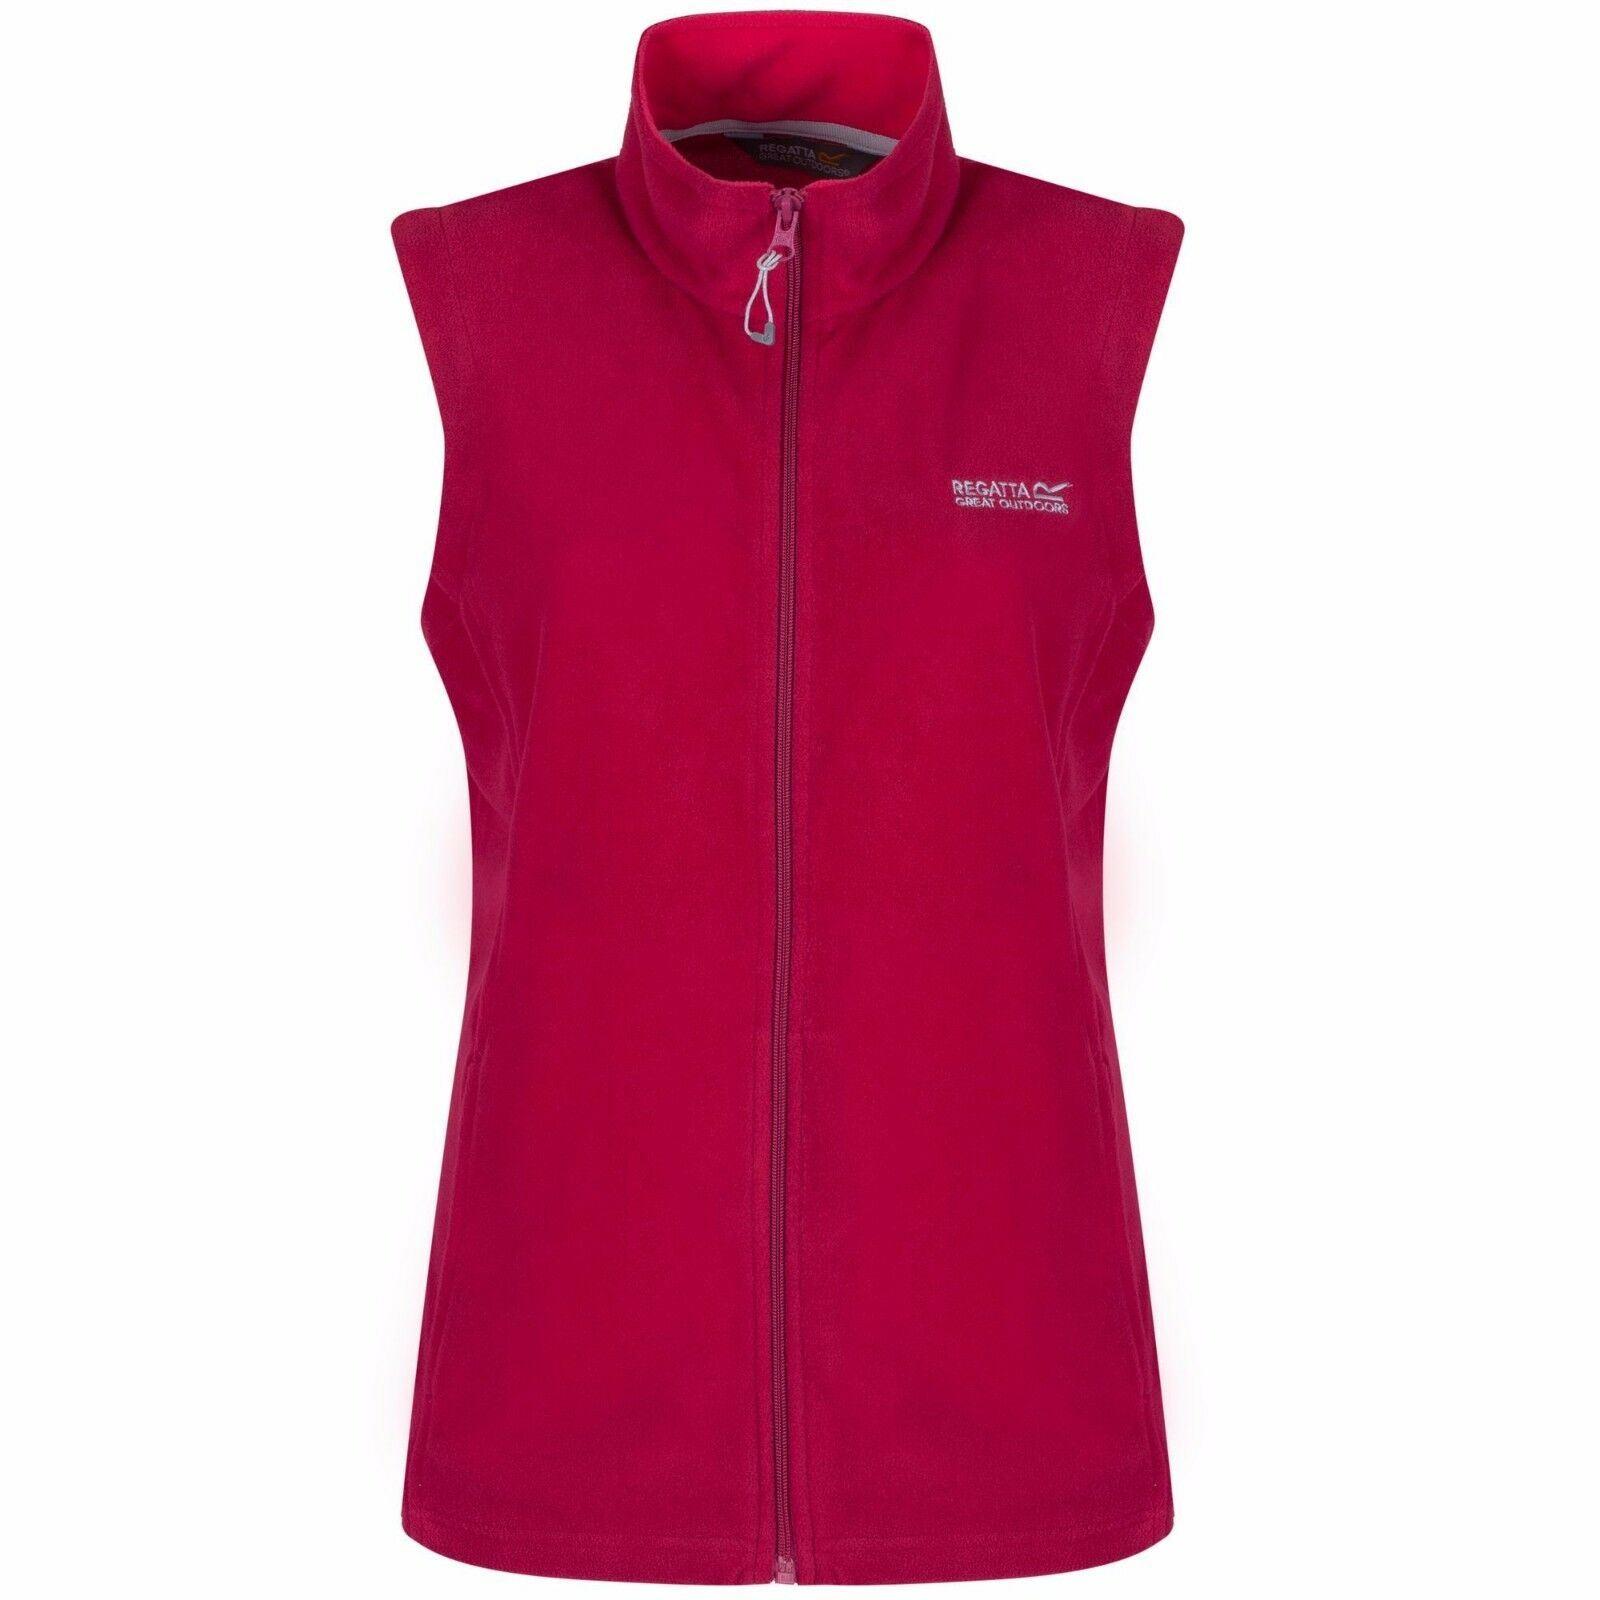 miniatuur 9 - Regatta Womens Sweetness Full Zip Micro Fleece Casual Bodywarmer Waistcoat